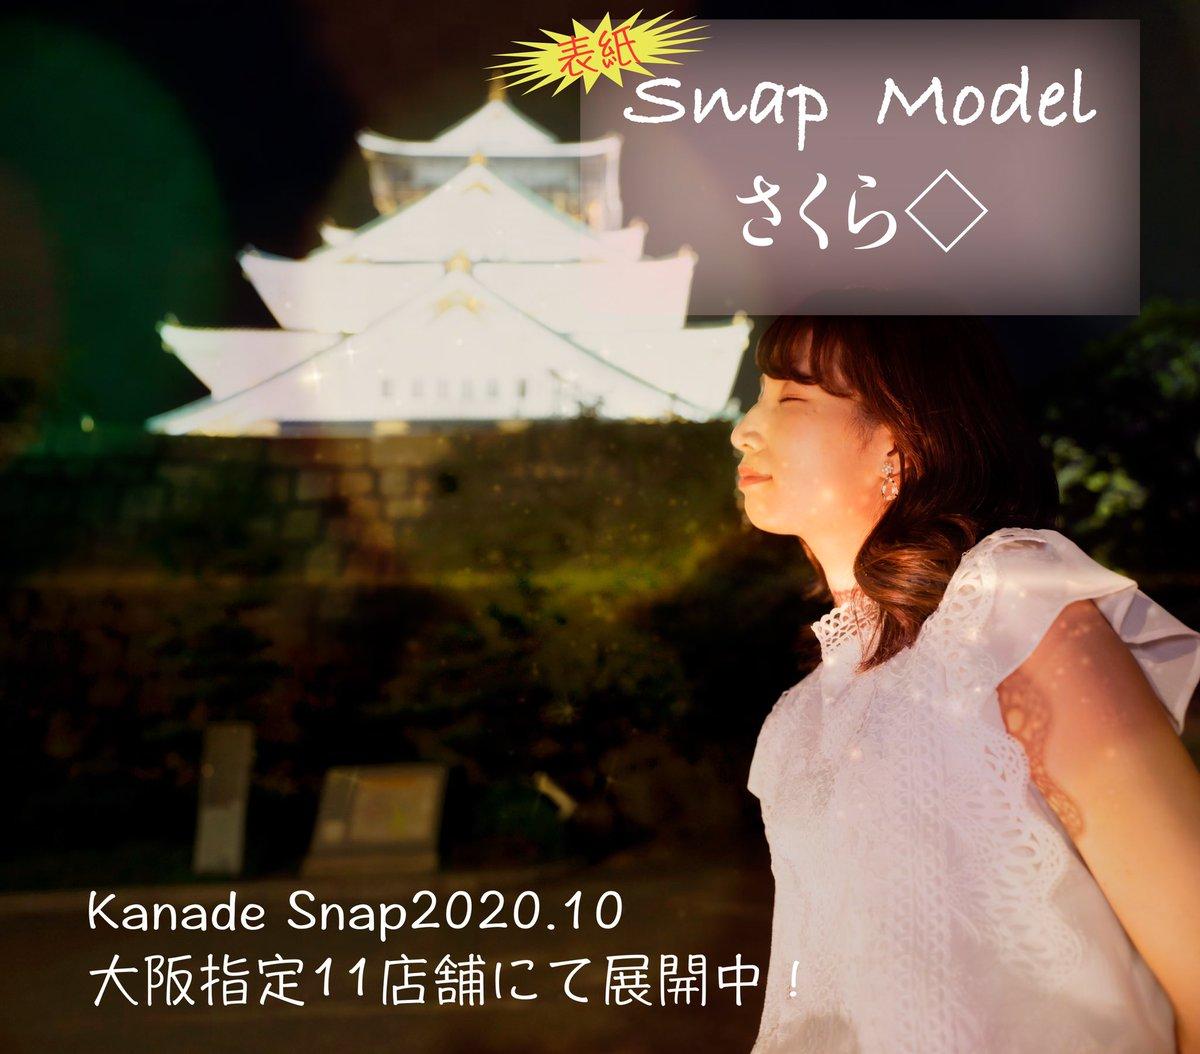 Kanade Snap2020.10表紙 @sakura11iro13   *大阪指定11店舗へ絶賛展開中!  #kanadesnap #portrait #大阪被写体 #Risu #fashion #band #art #camera #osaka #music #music https://t.co/IIAZMil4bt